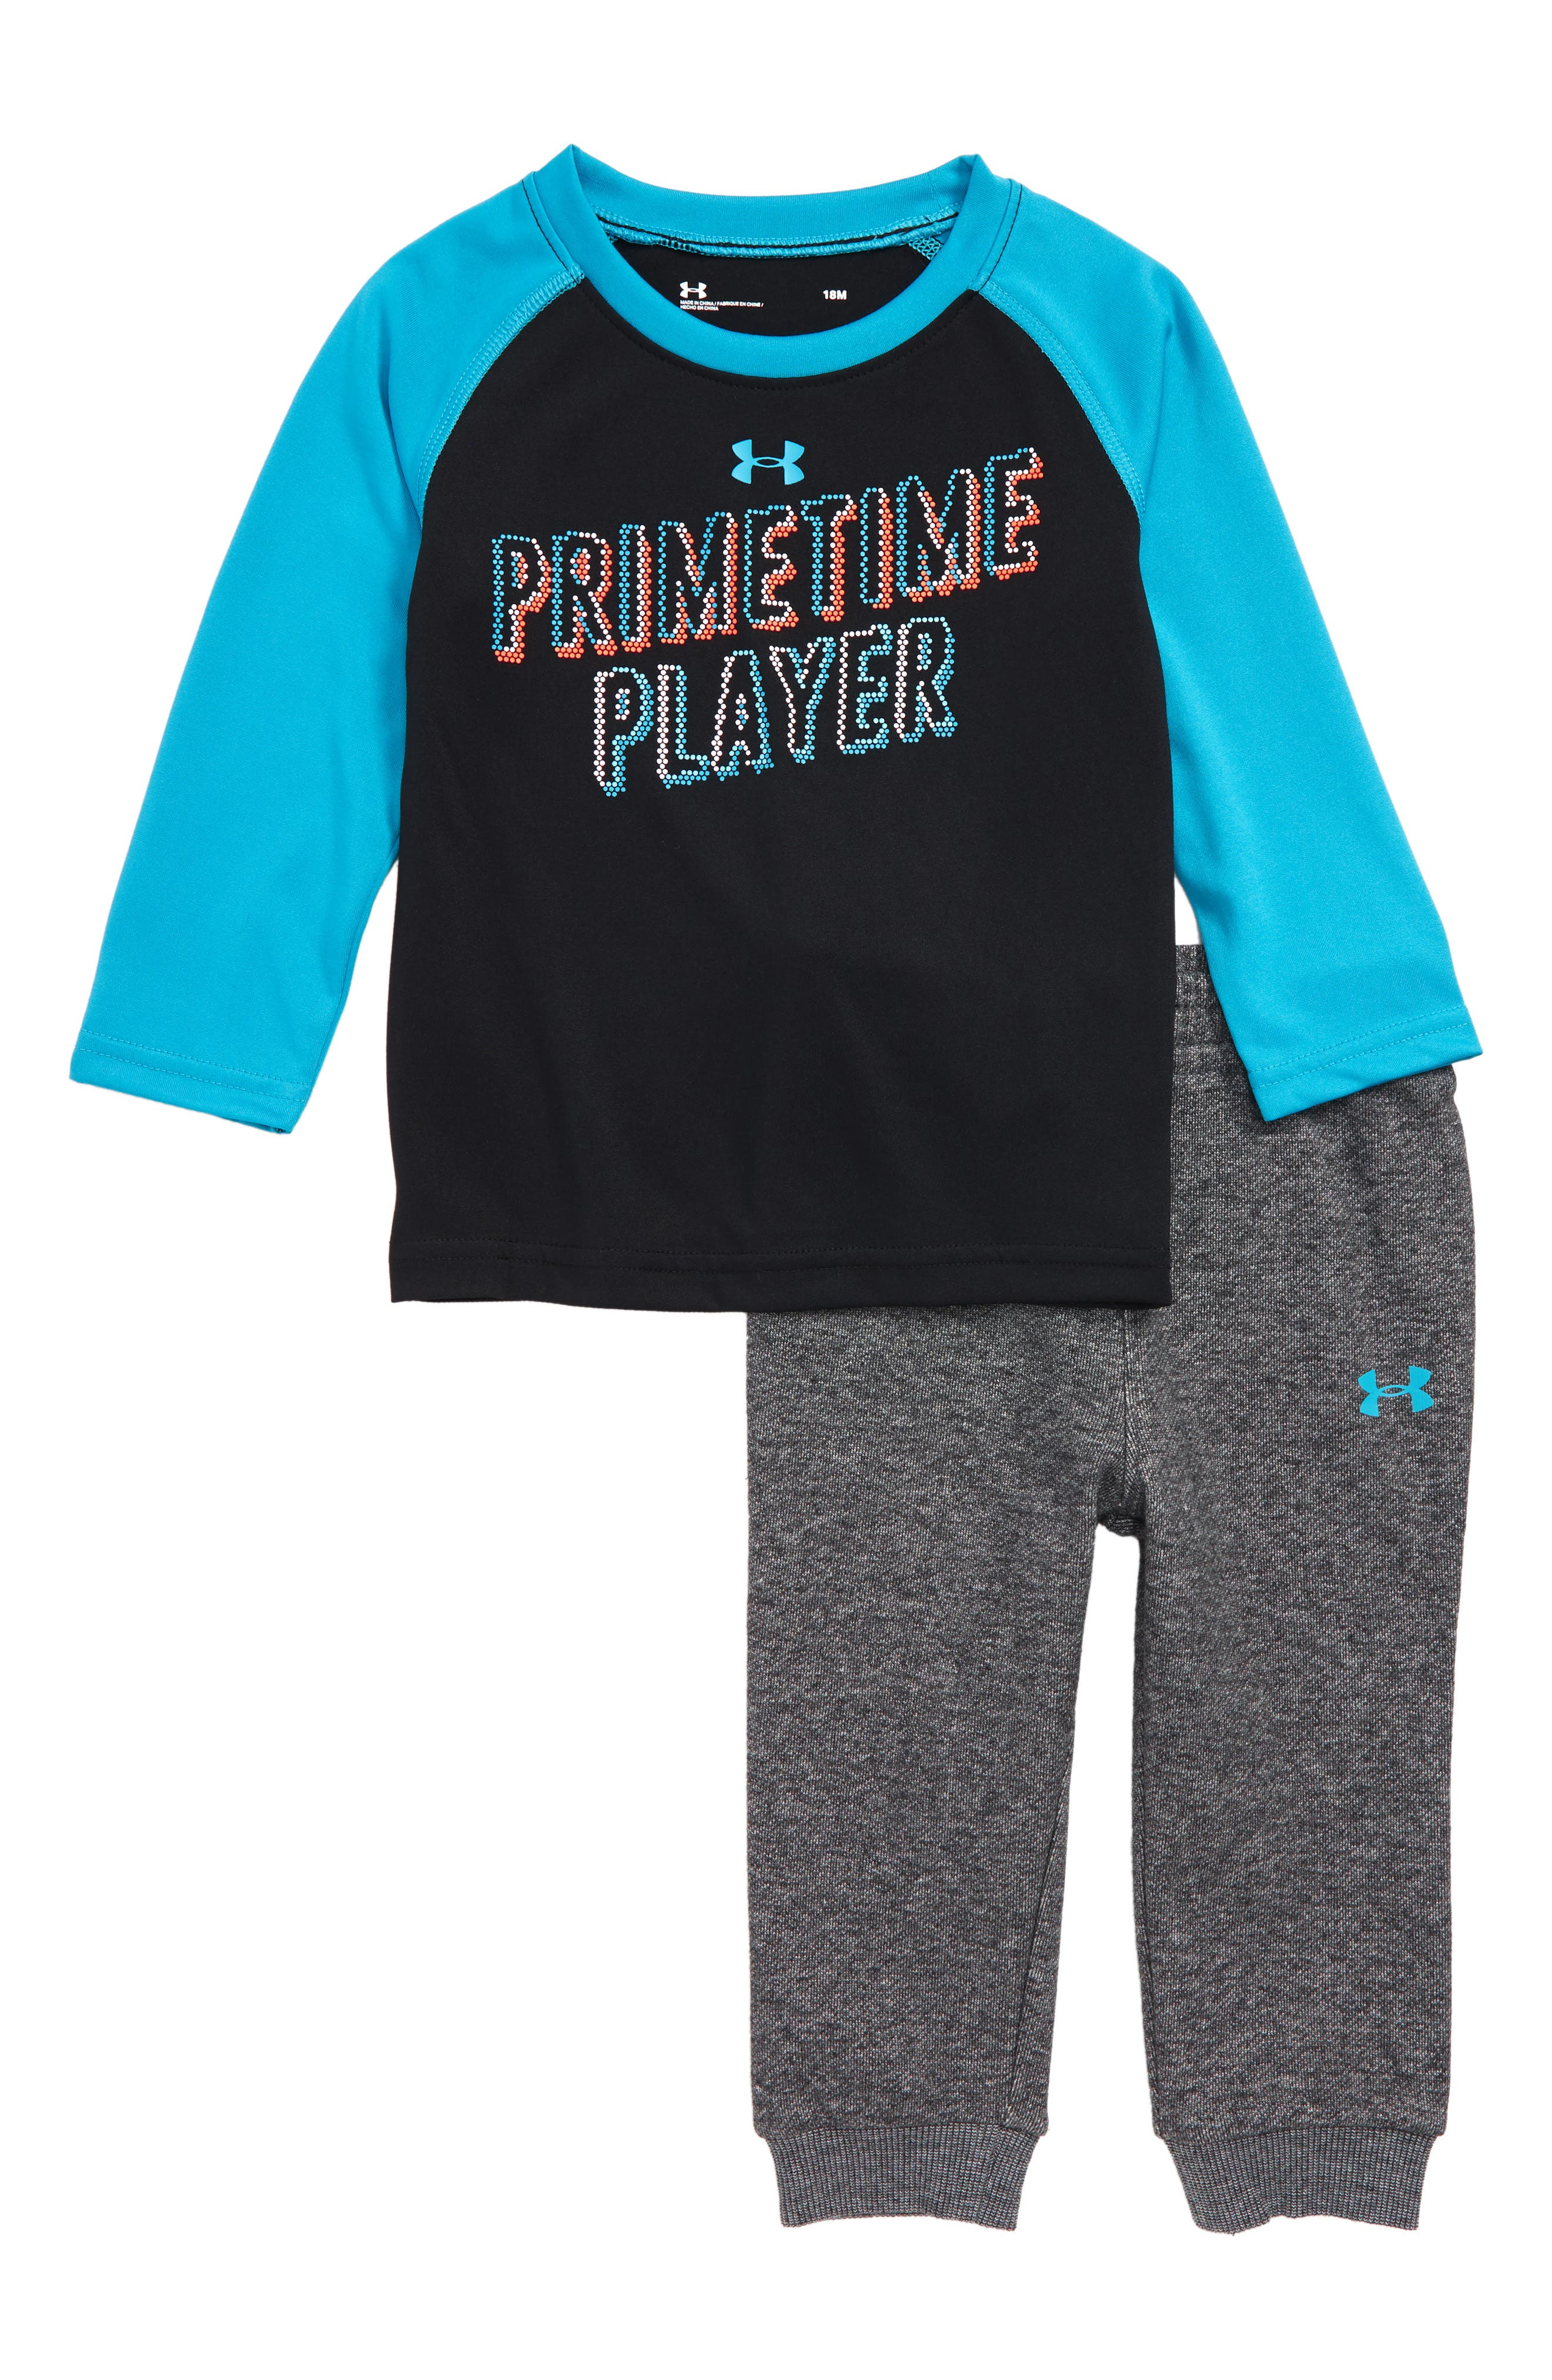 Primetime Player T-Shirt & Sweatpants Set,                             Main thumbnail 1, color,                             001